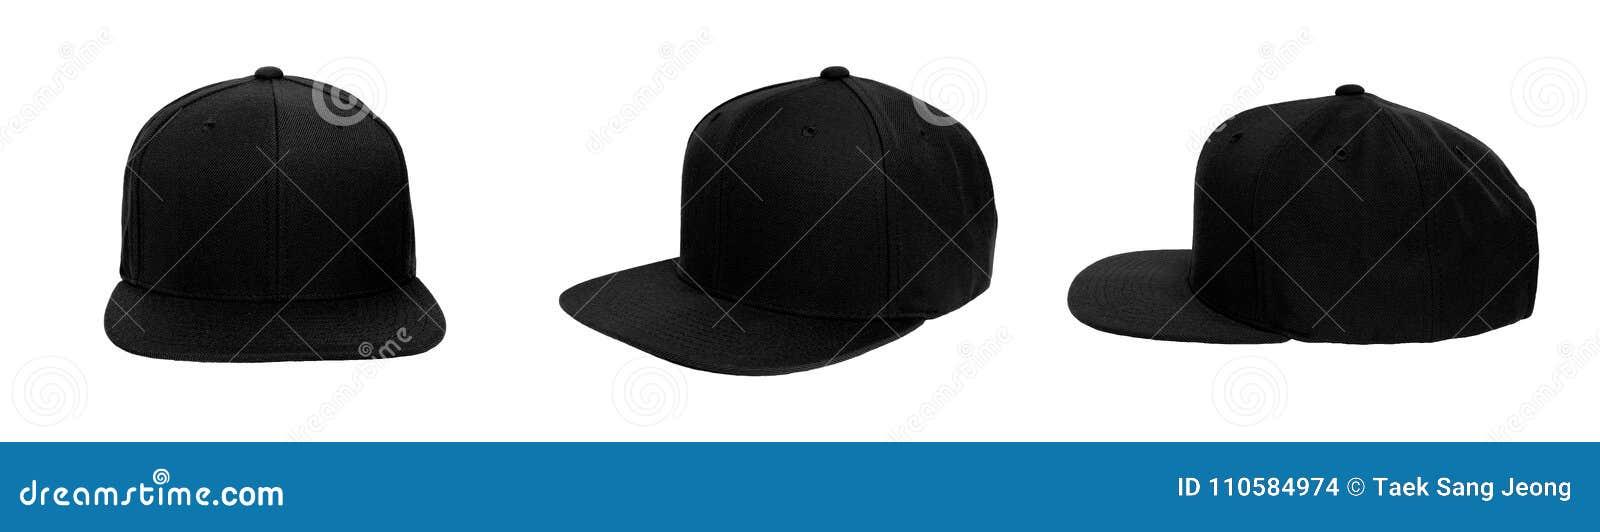 Blank baseball snap back cap color black